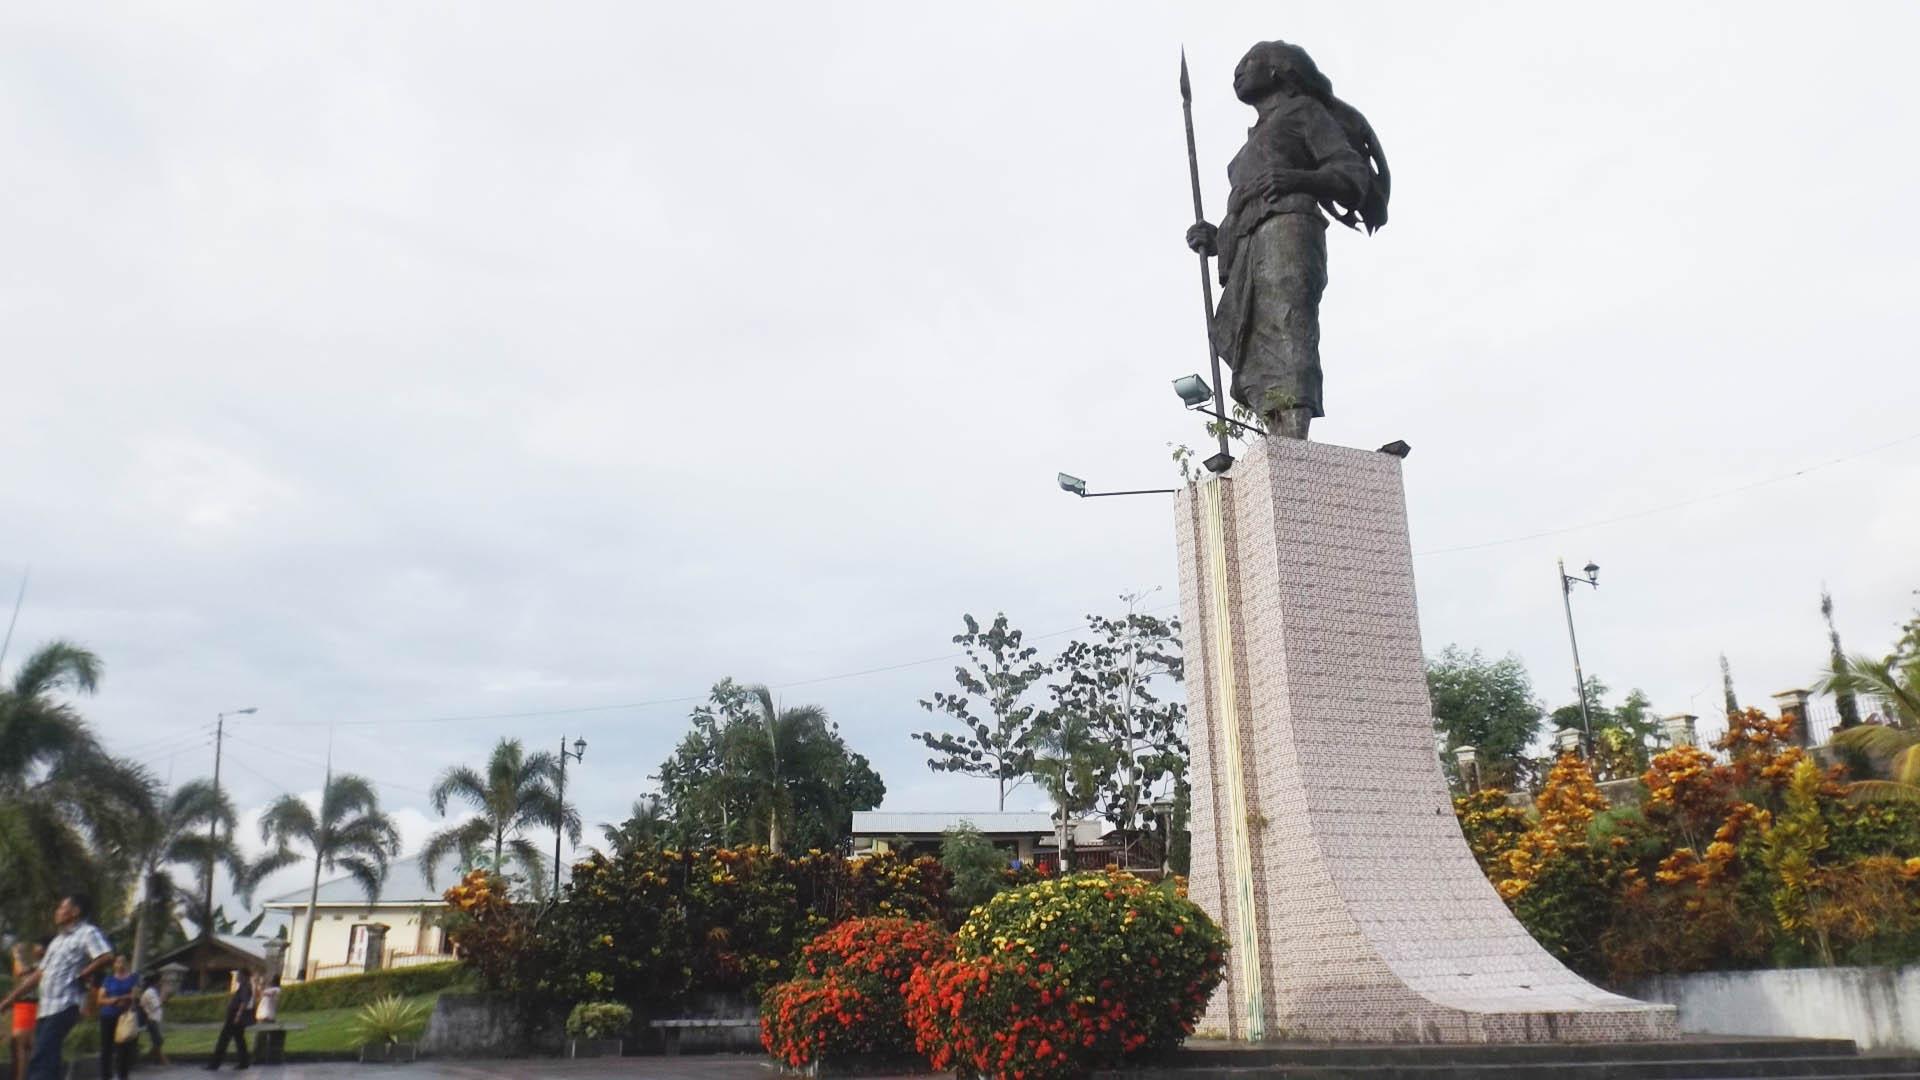 Mengunjungi Monumen Martha Tiahahu Pejuang Wanita Maluku Sekeliling Patung Taman